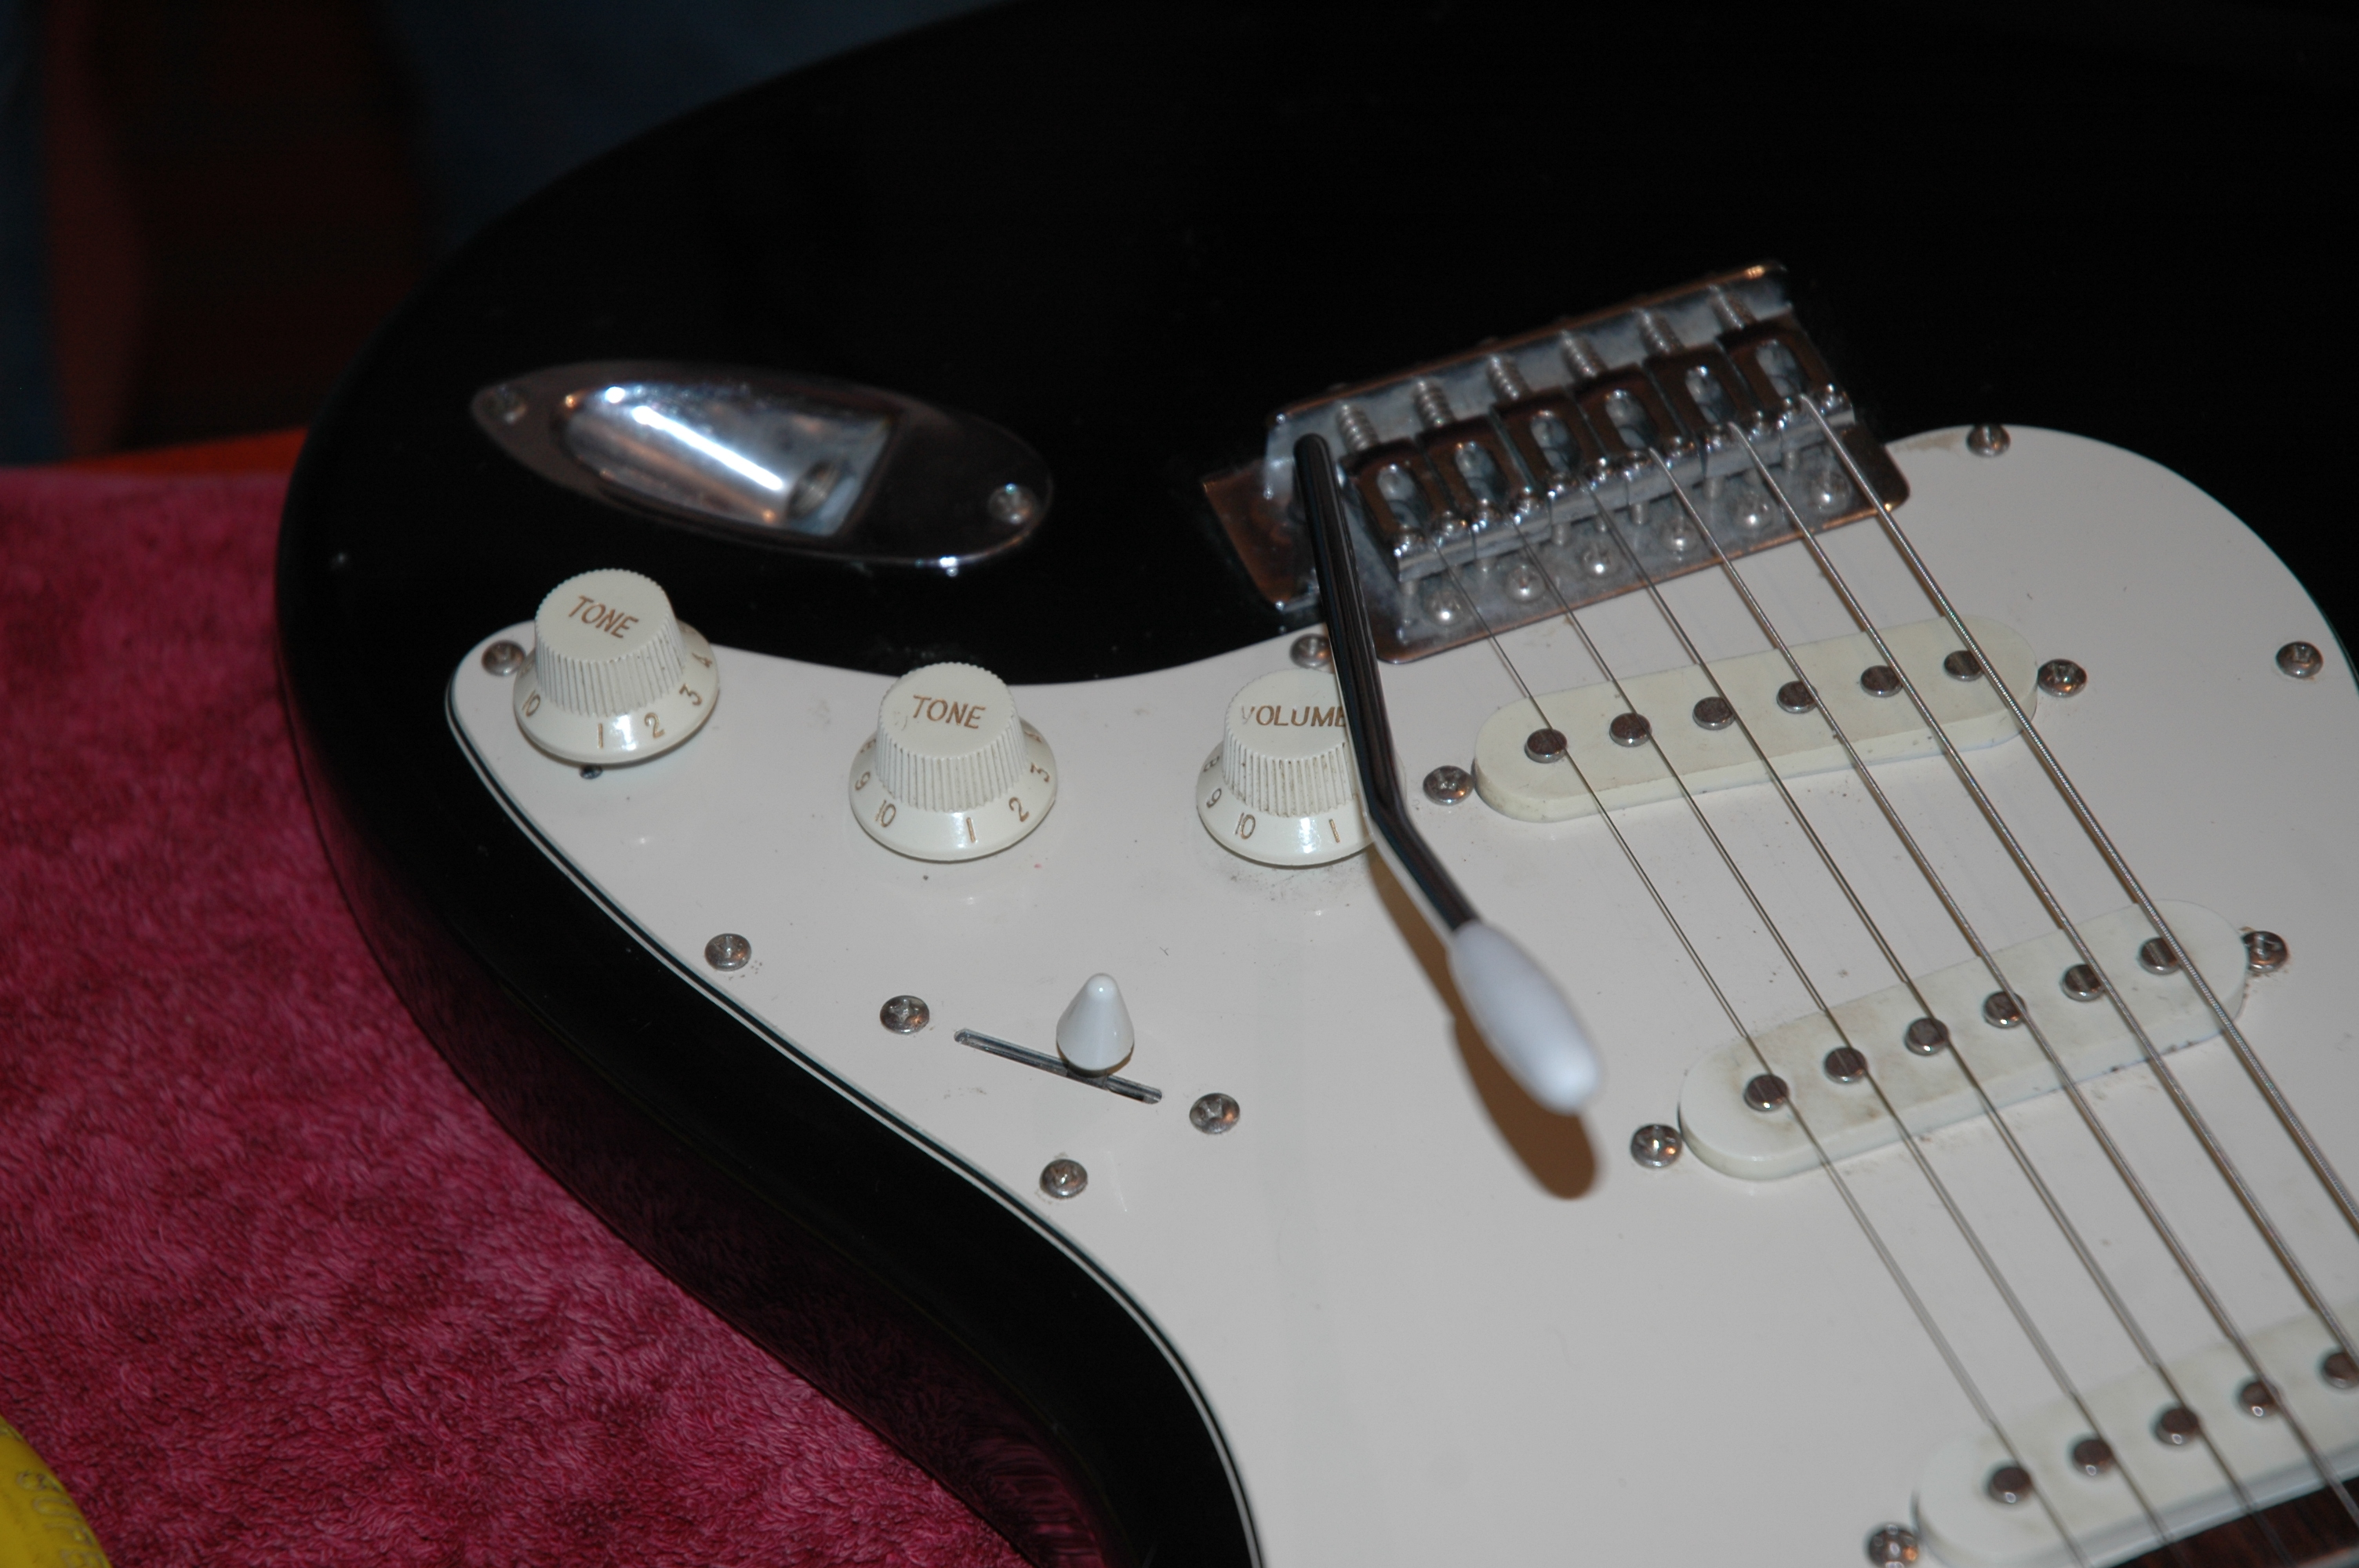 Varitone mod on Stratocaster clone guitar